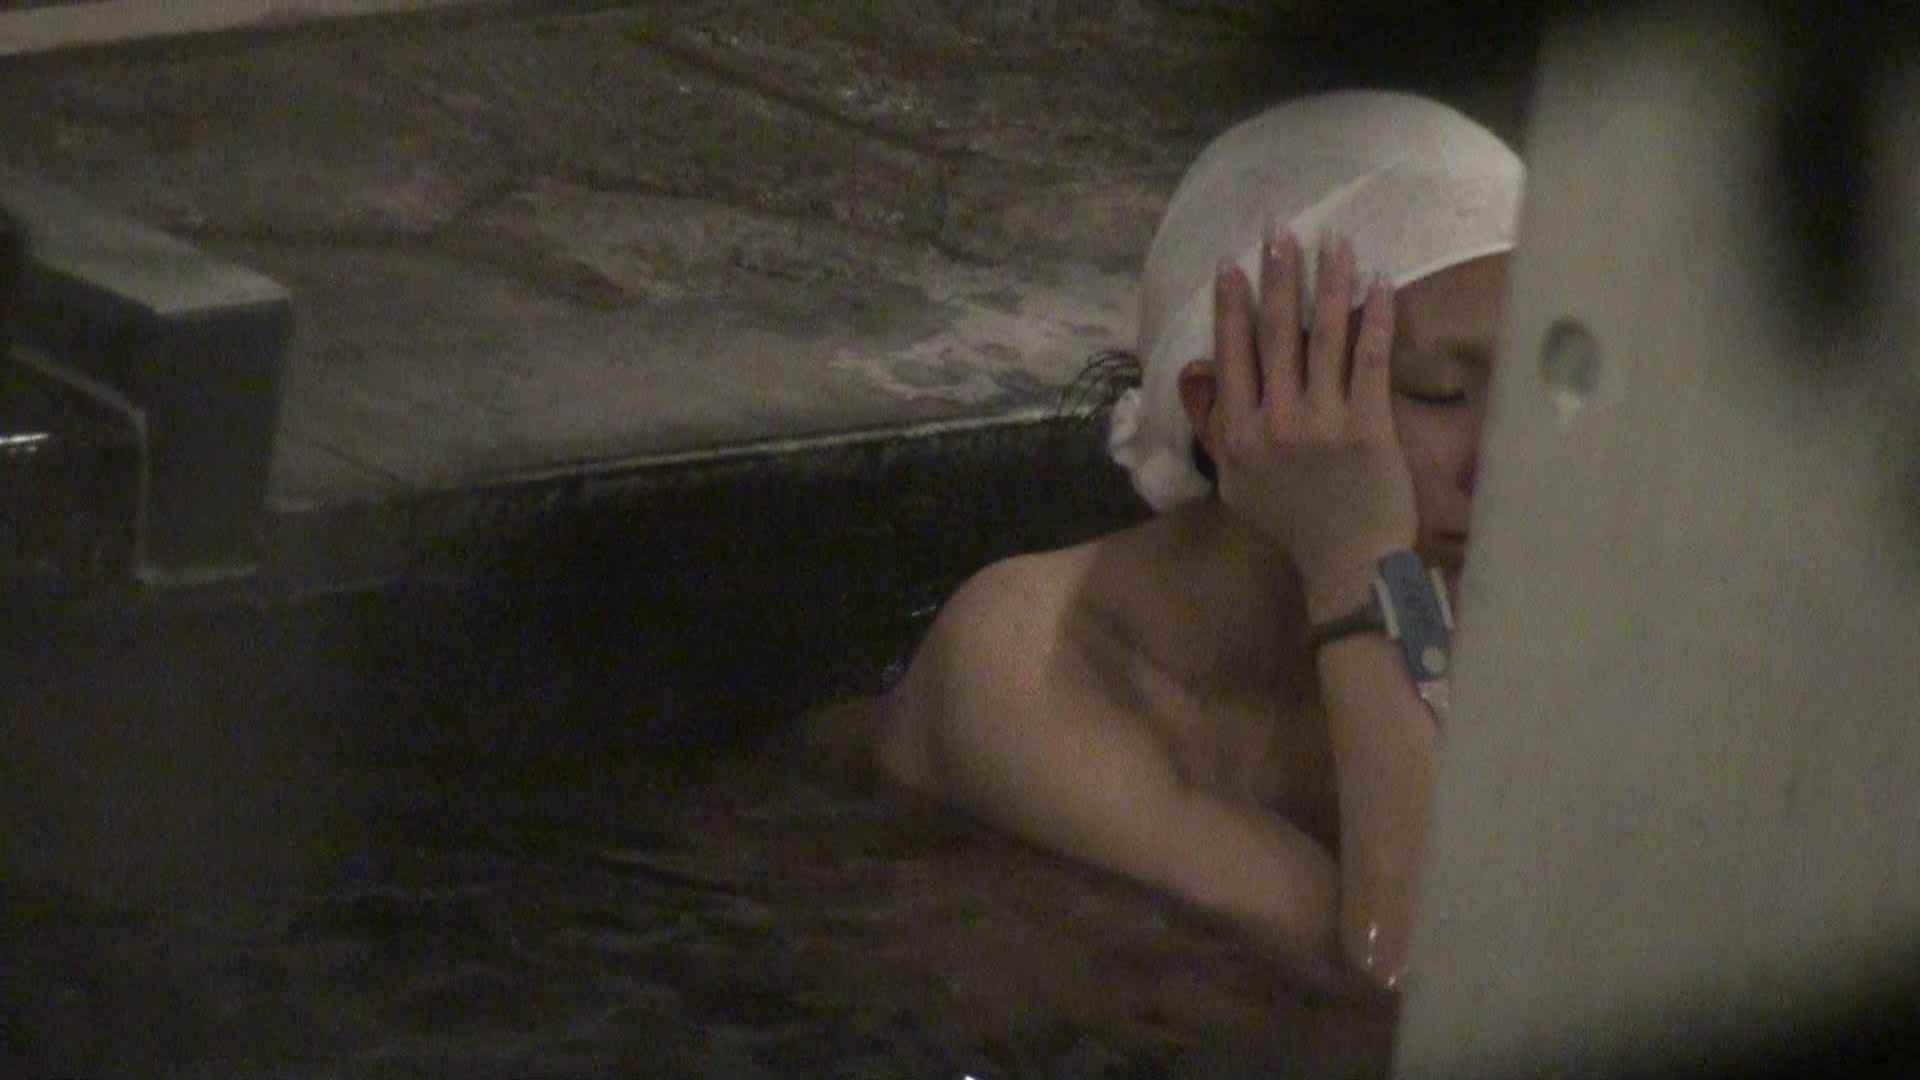 Aquaな露天風呂Vol.427 盗撮 AV動画キャプチャ 51画像 35